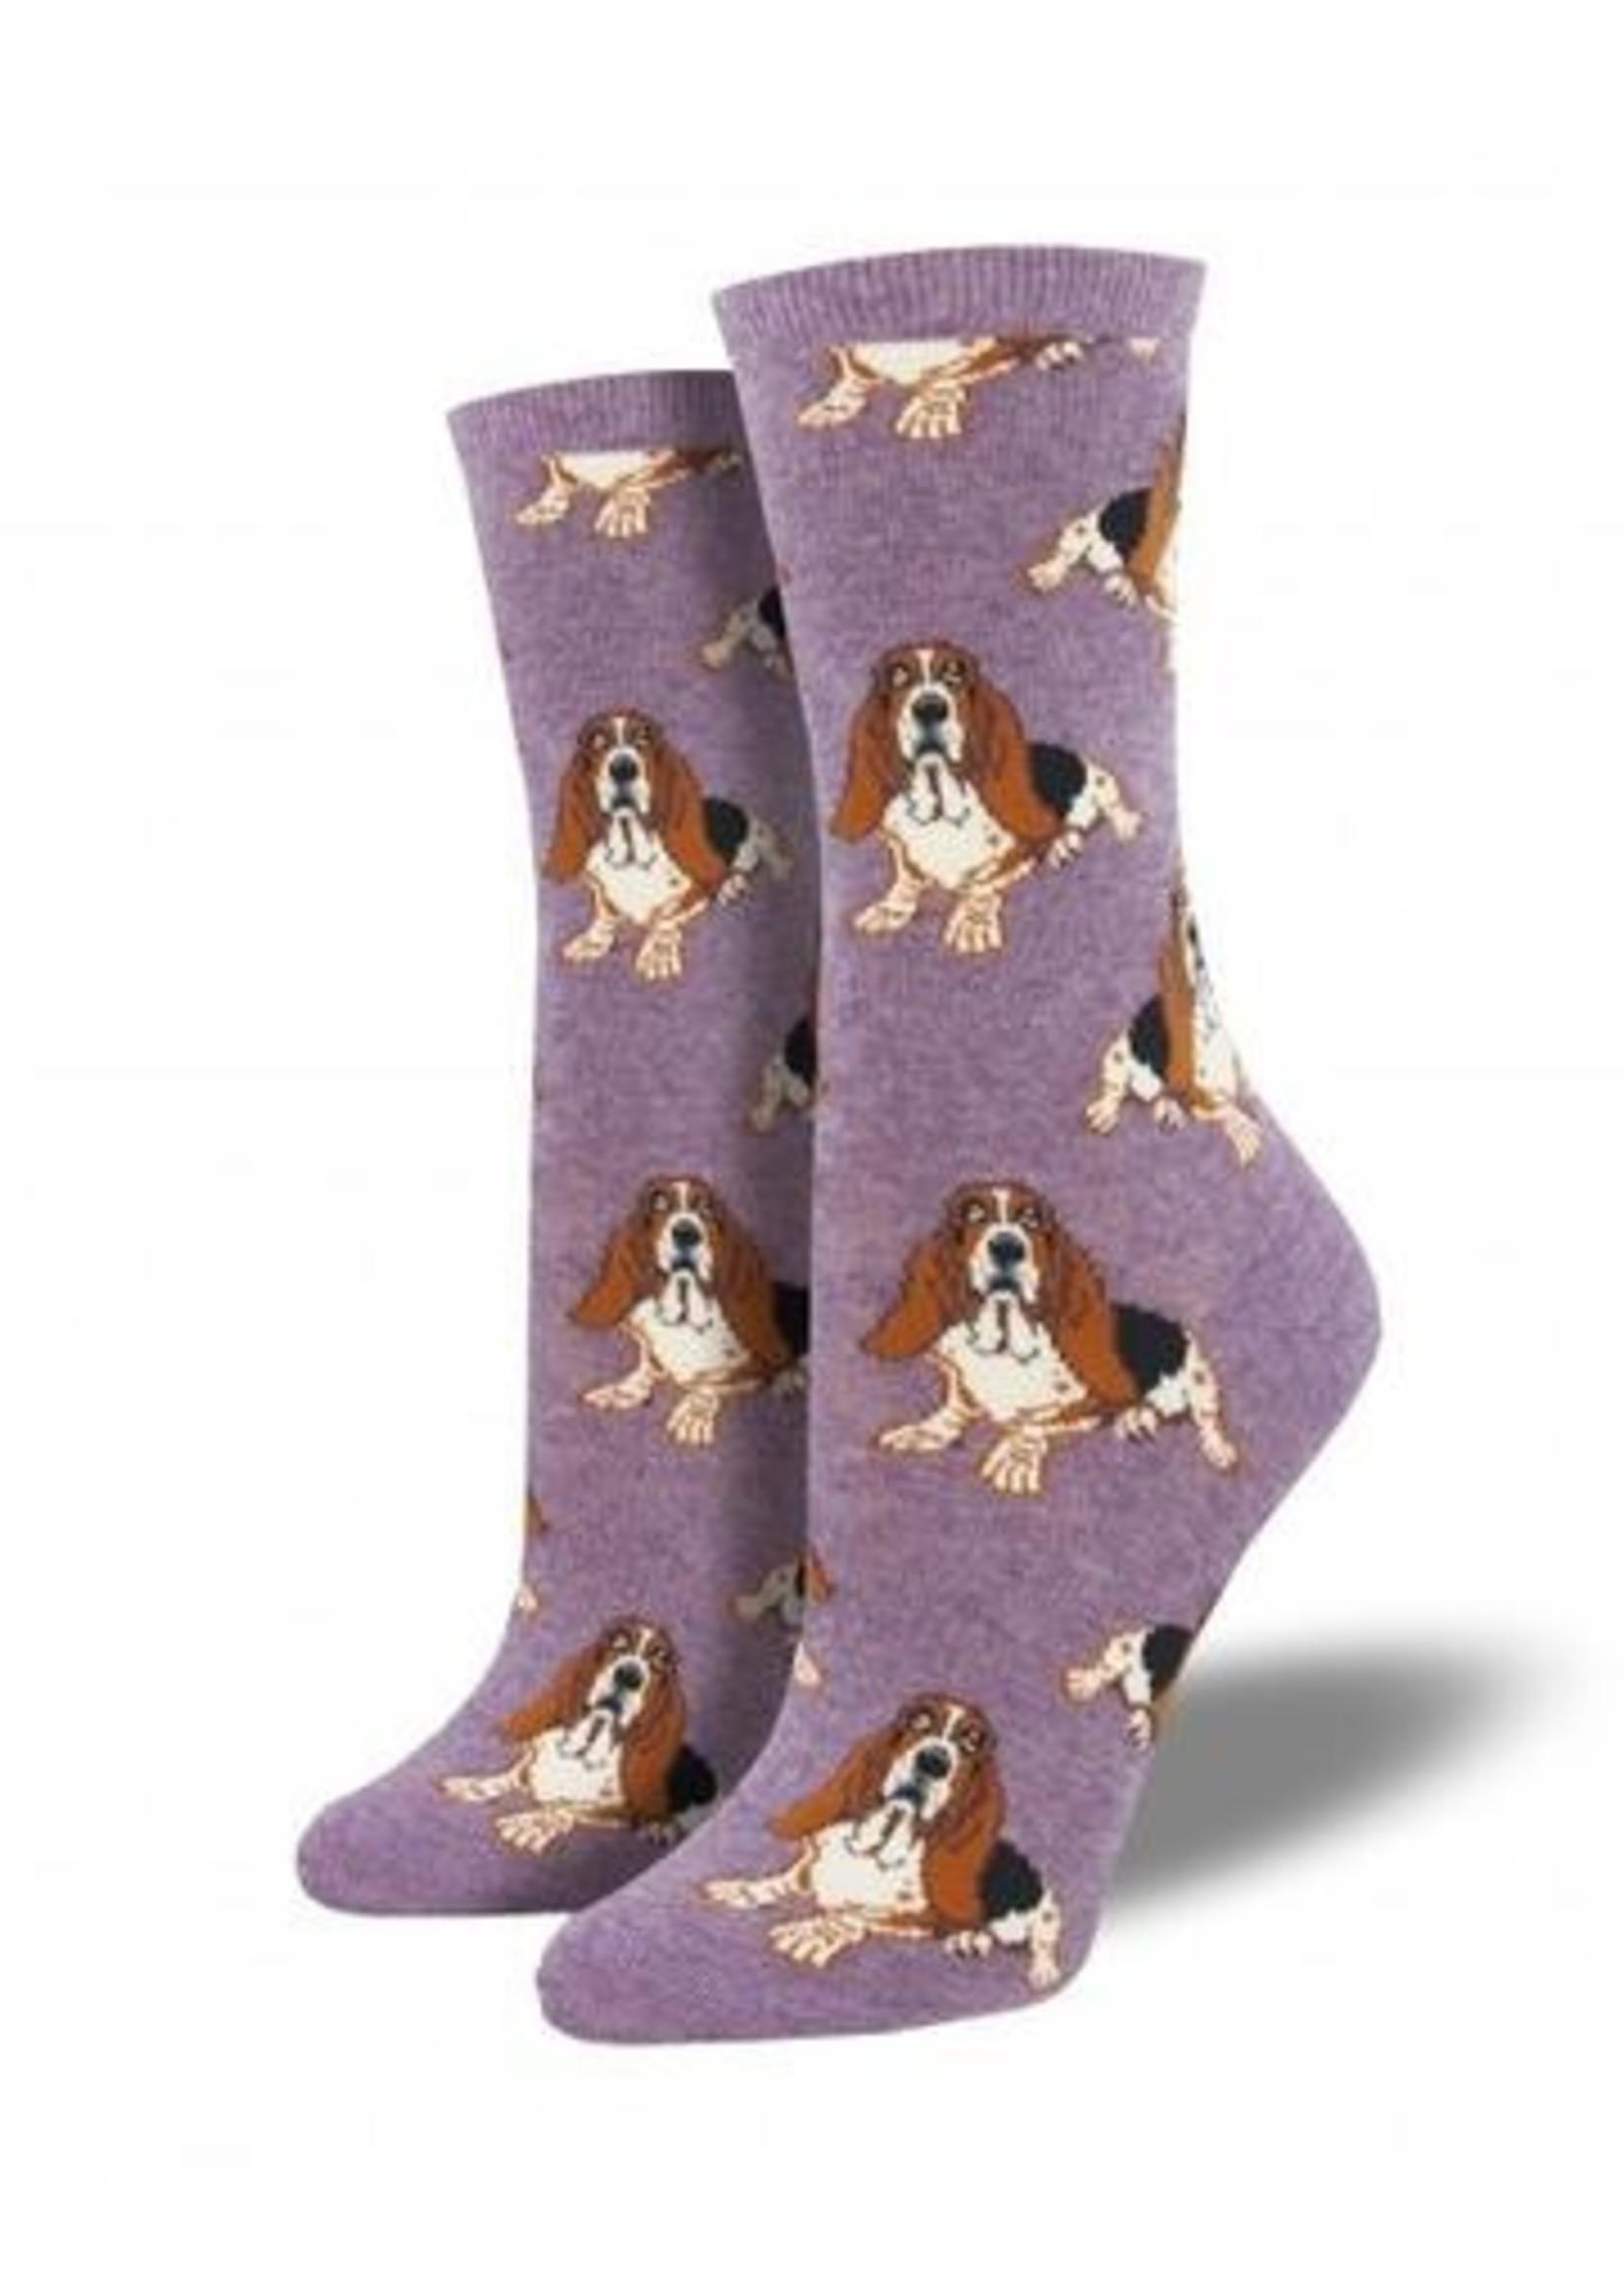 Socksmith Canada Inc WOMEN'S NOTHING BUT A HOUND DOG SOCKS